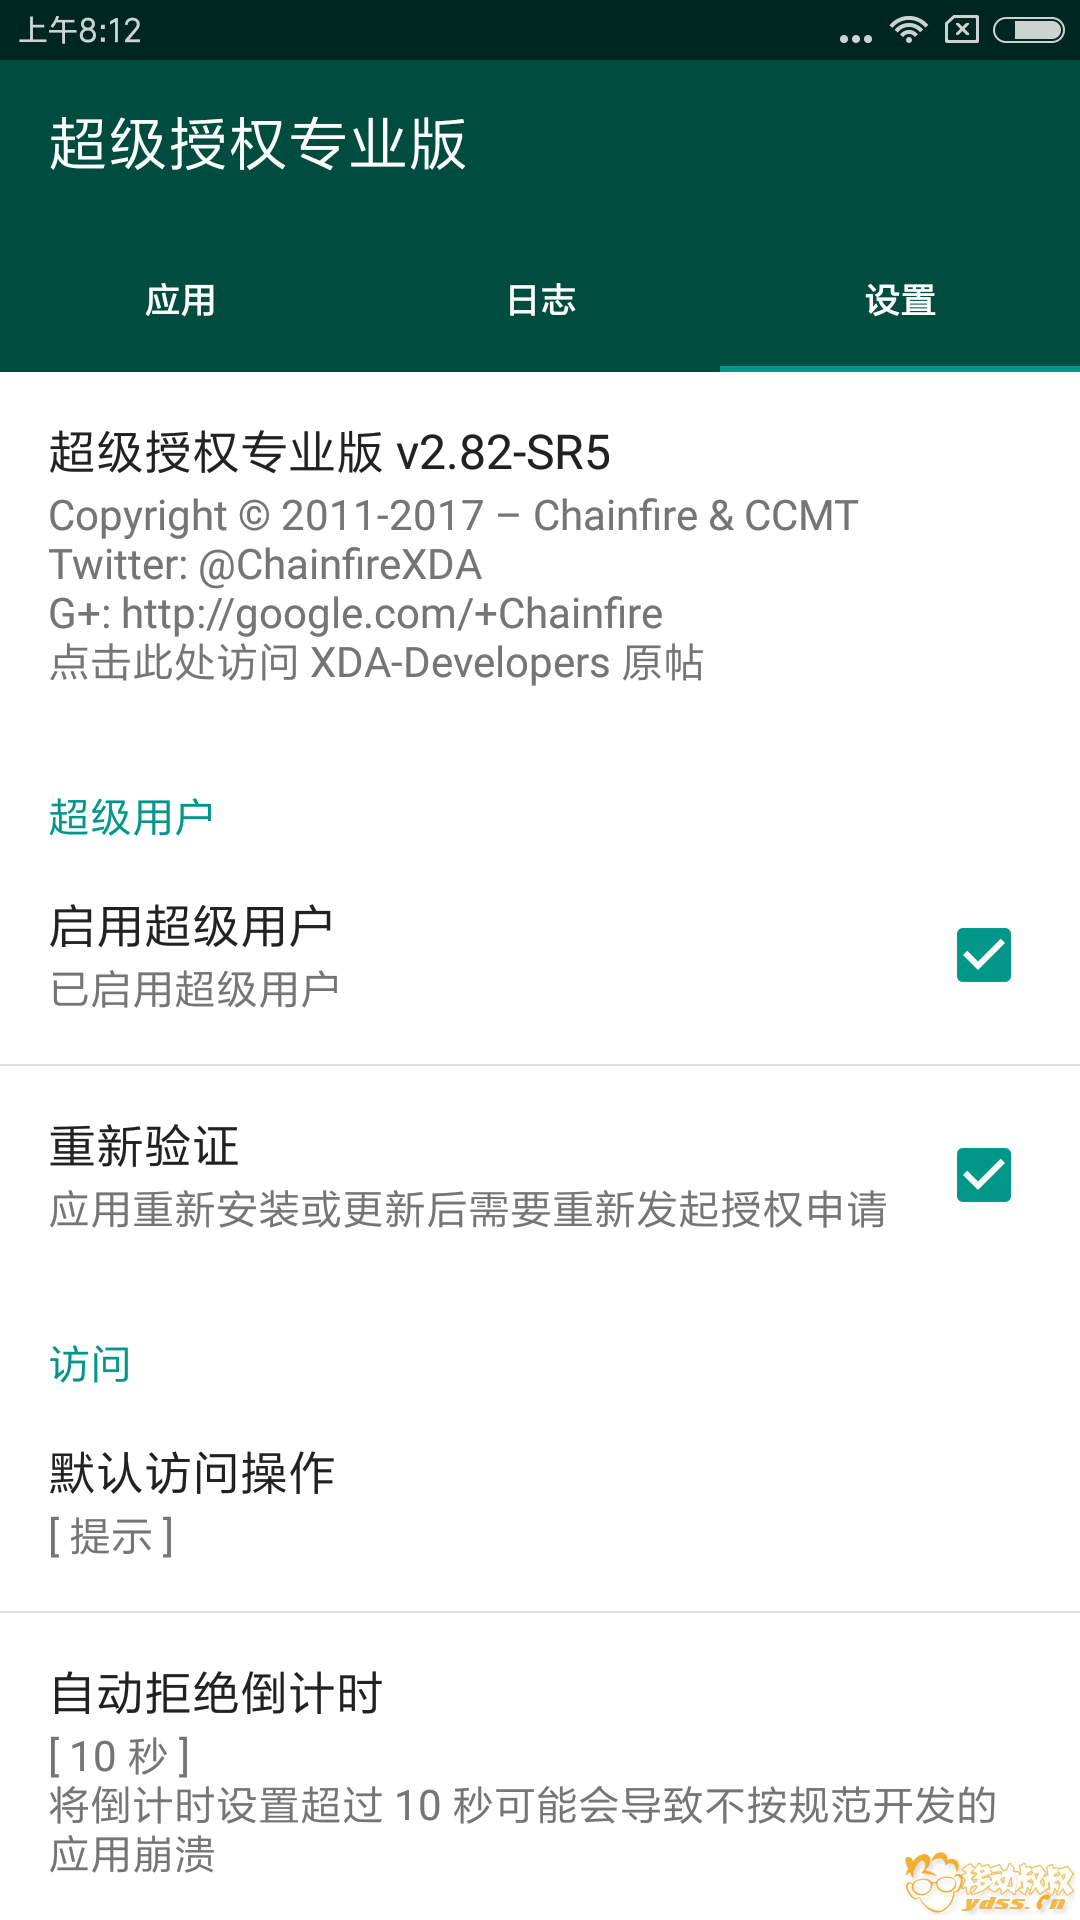 Screenshot_2018-04-16-08-12-57-321_eu.chainfire.supersu.png